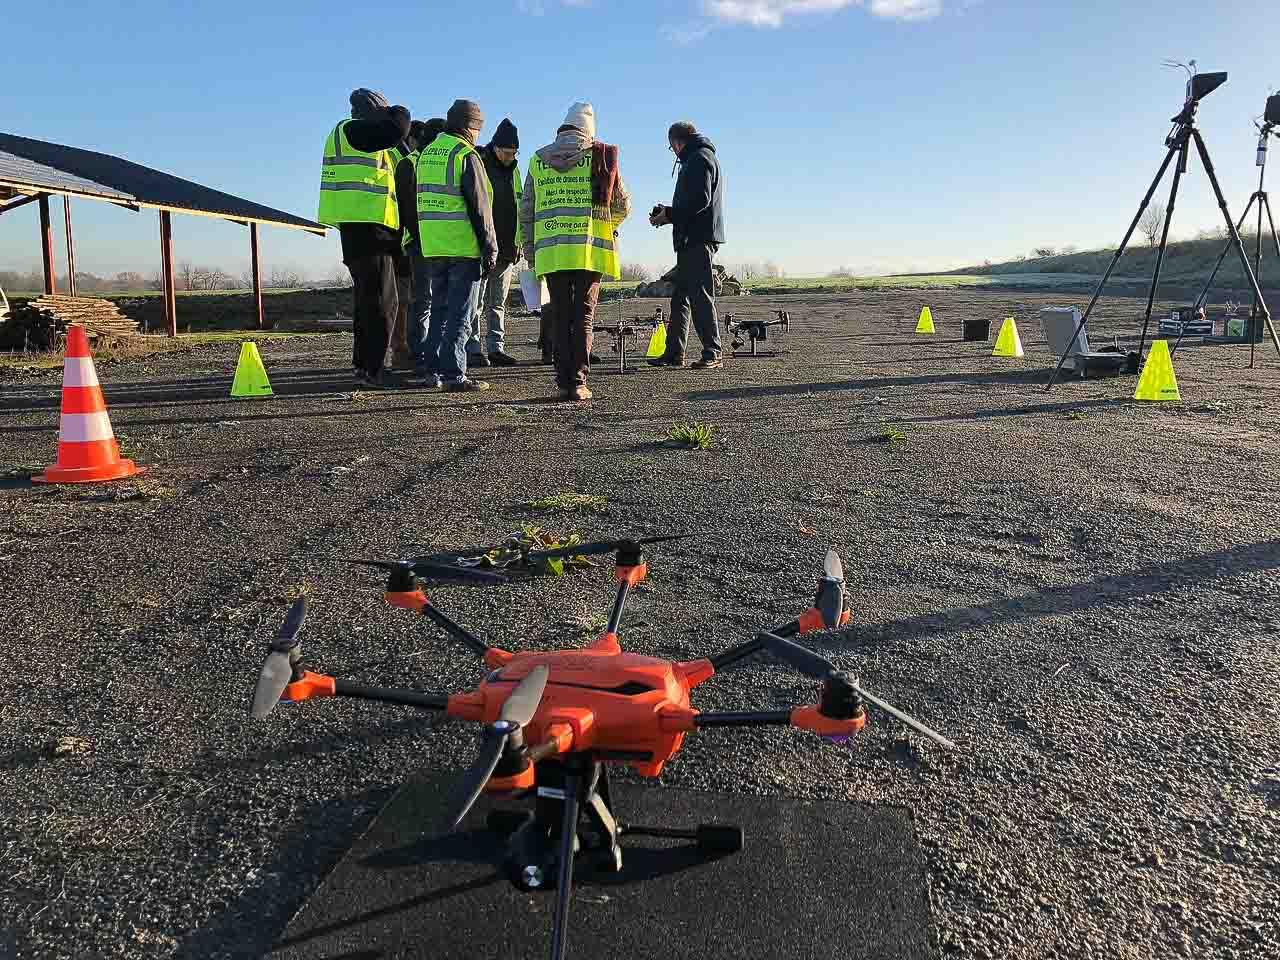 Promotion acheter drone magasin, avis drone ballon